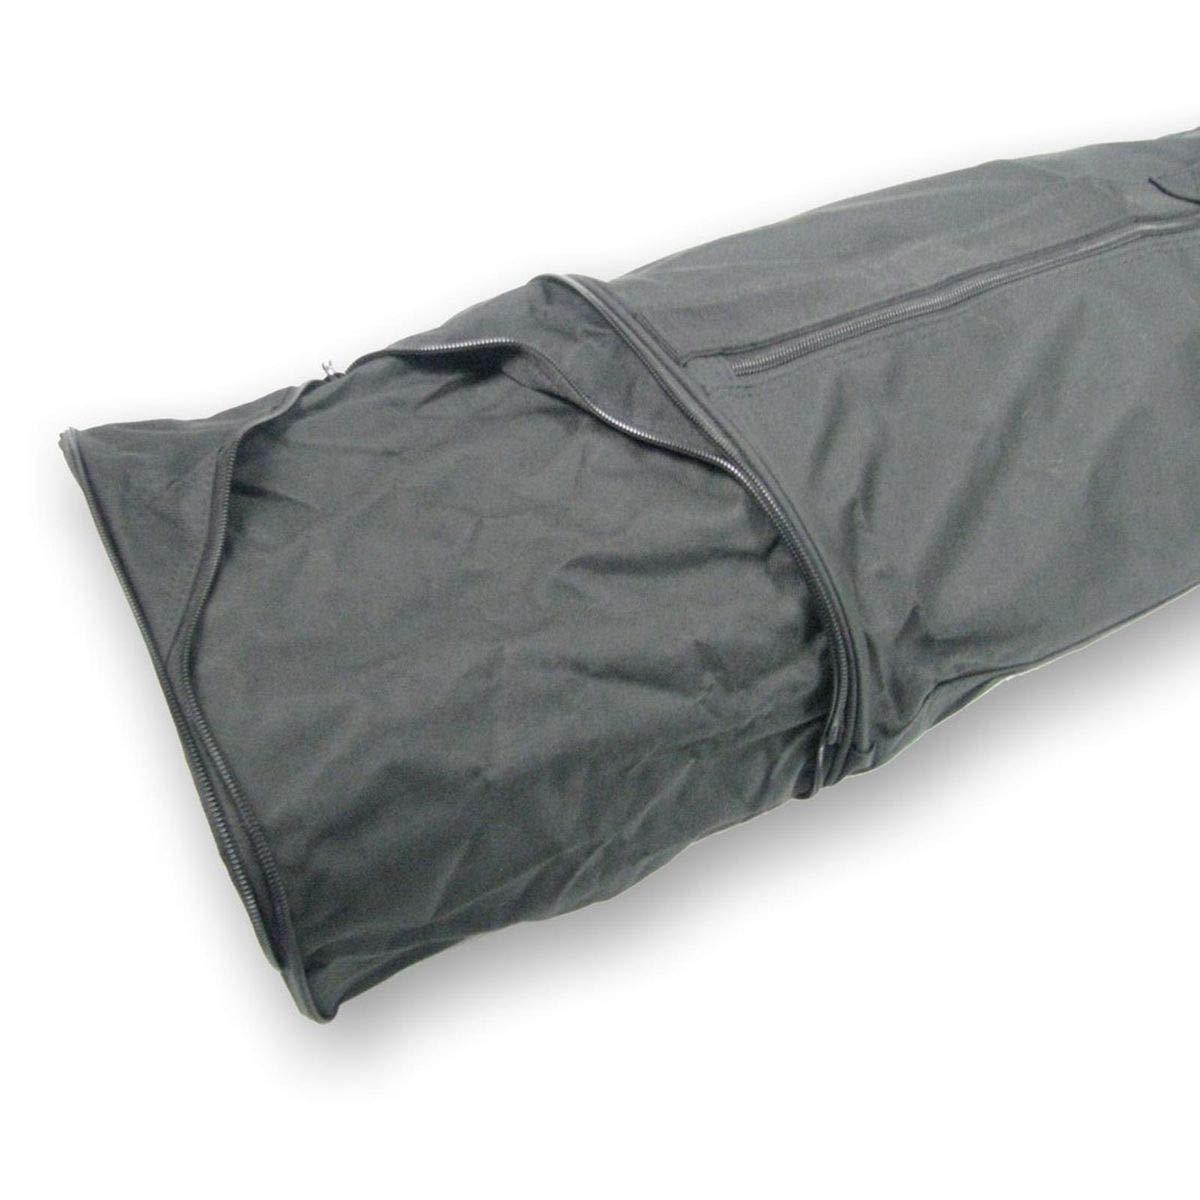 ON ski pour extender cover 170-195 x 24 x 15 cm vario bag